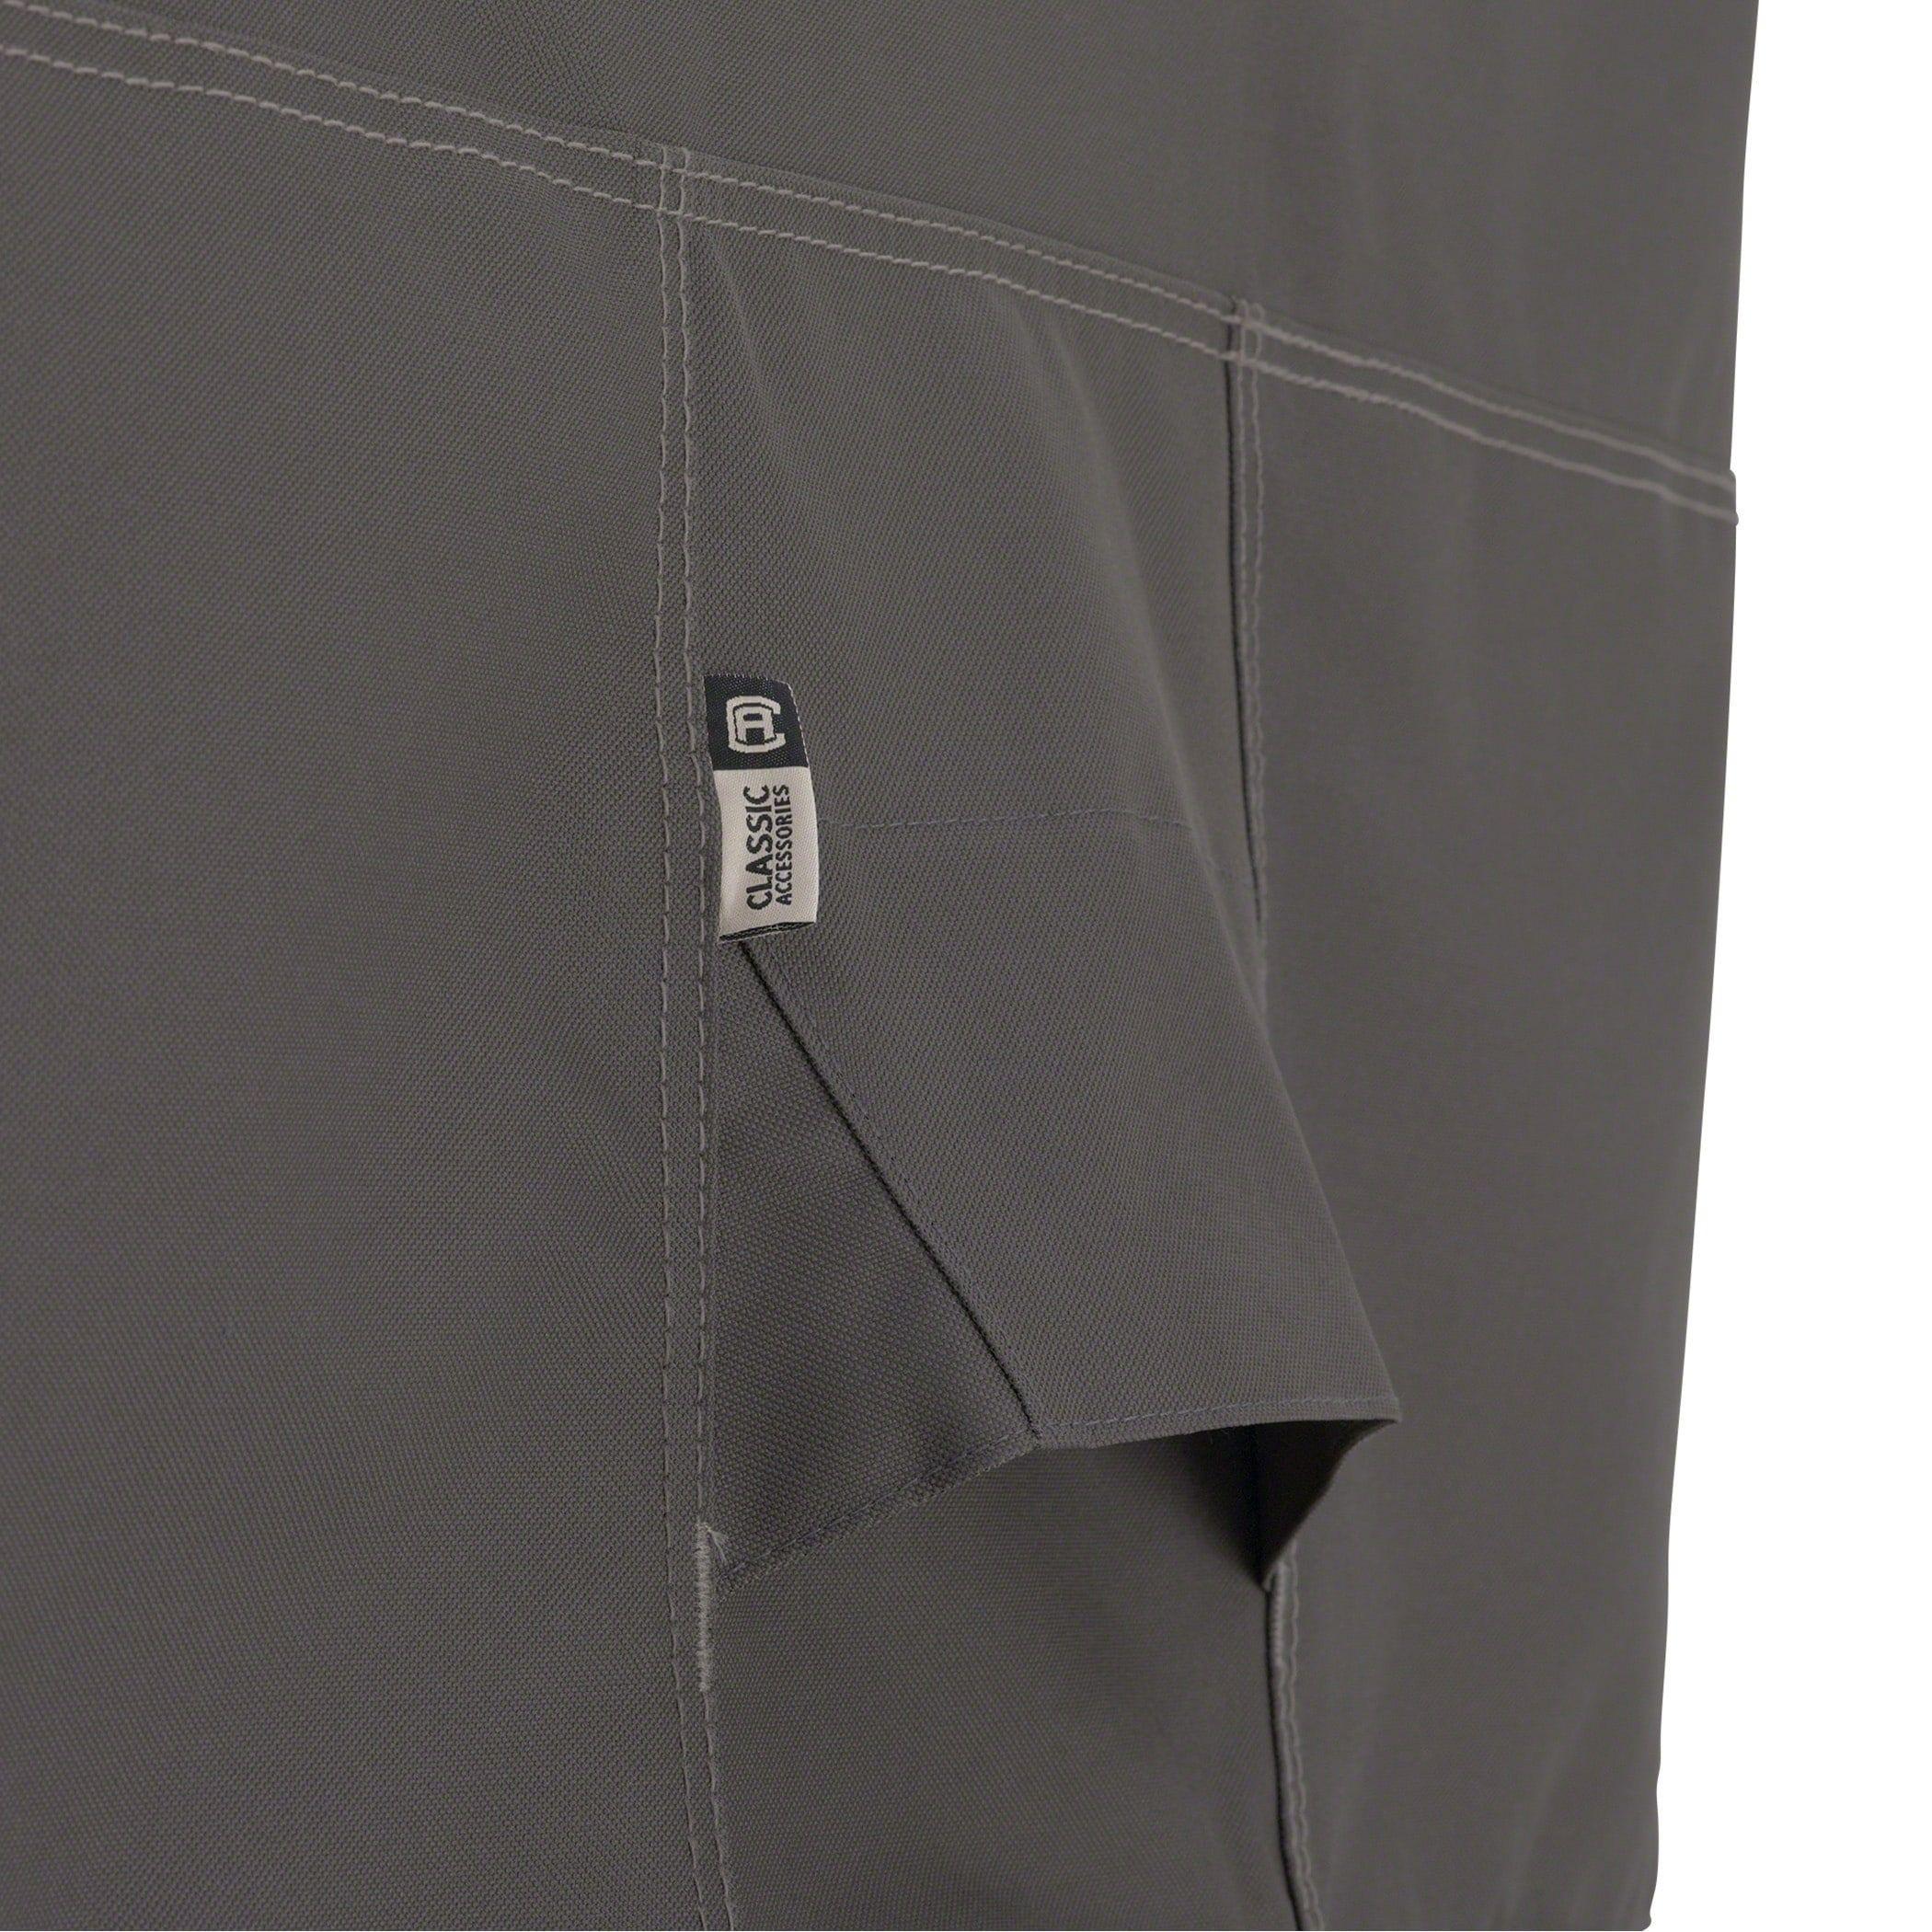 Classic Accessories Ravenna Patio Umbrella Cover Grey Polyester